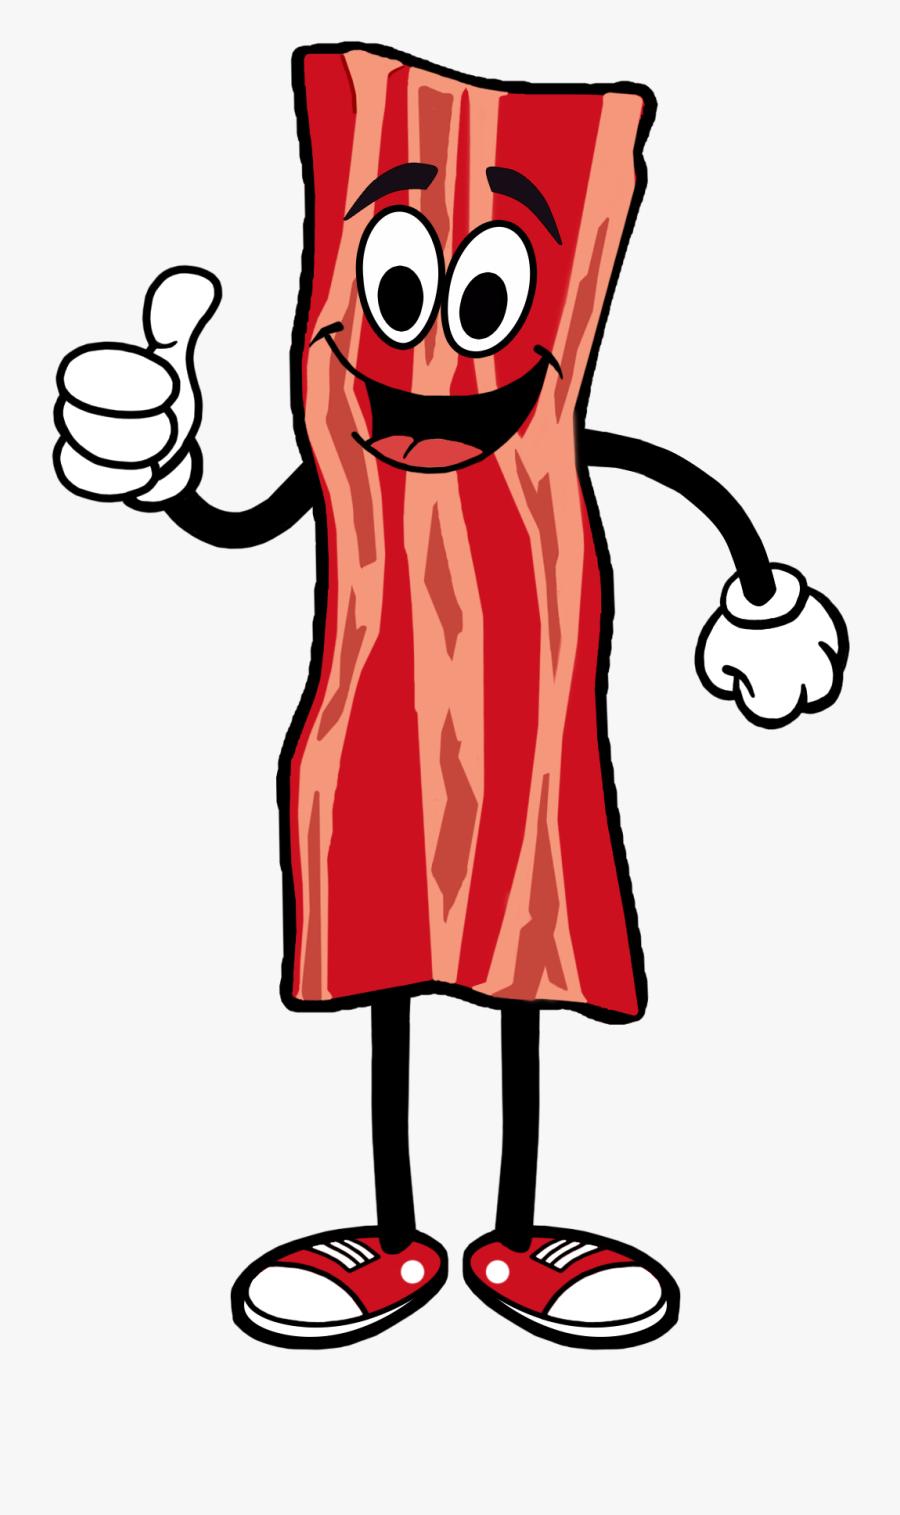 Bacon Cartoon Transparent Background.